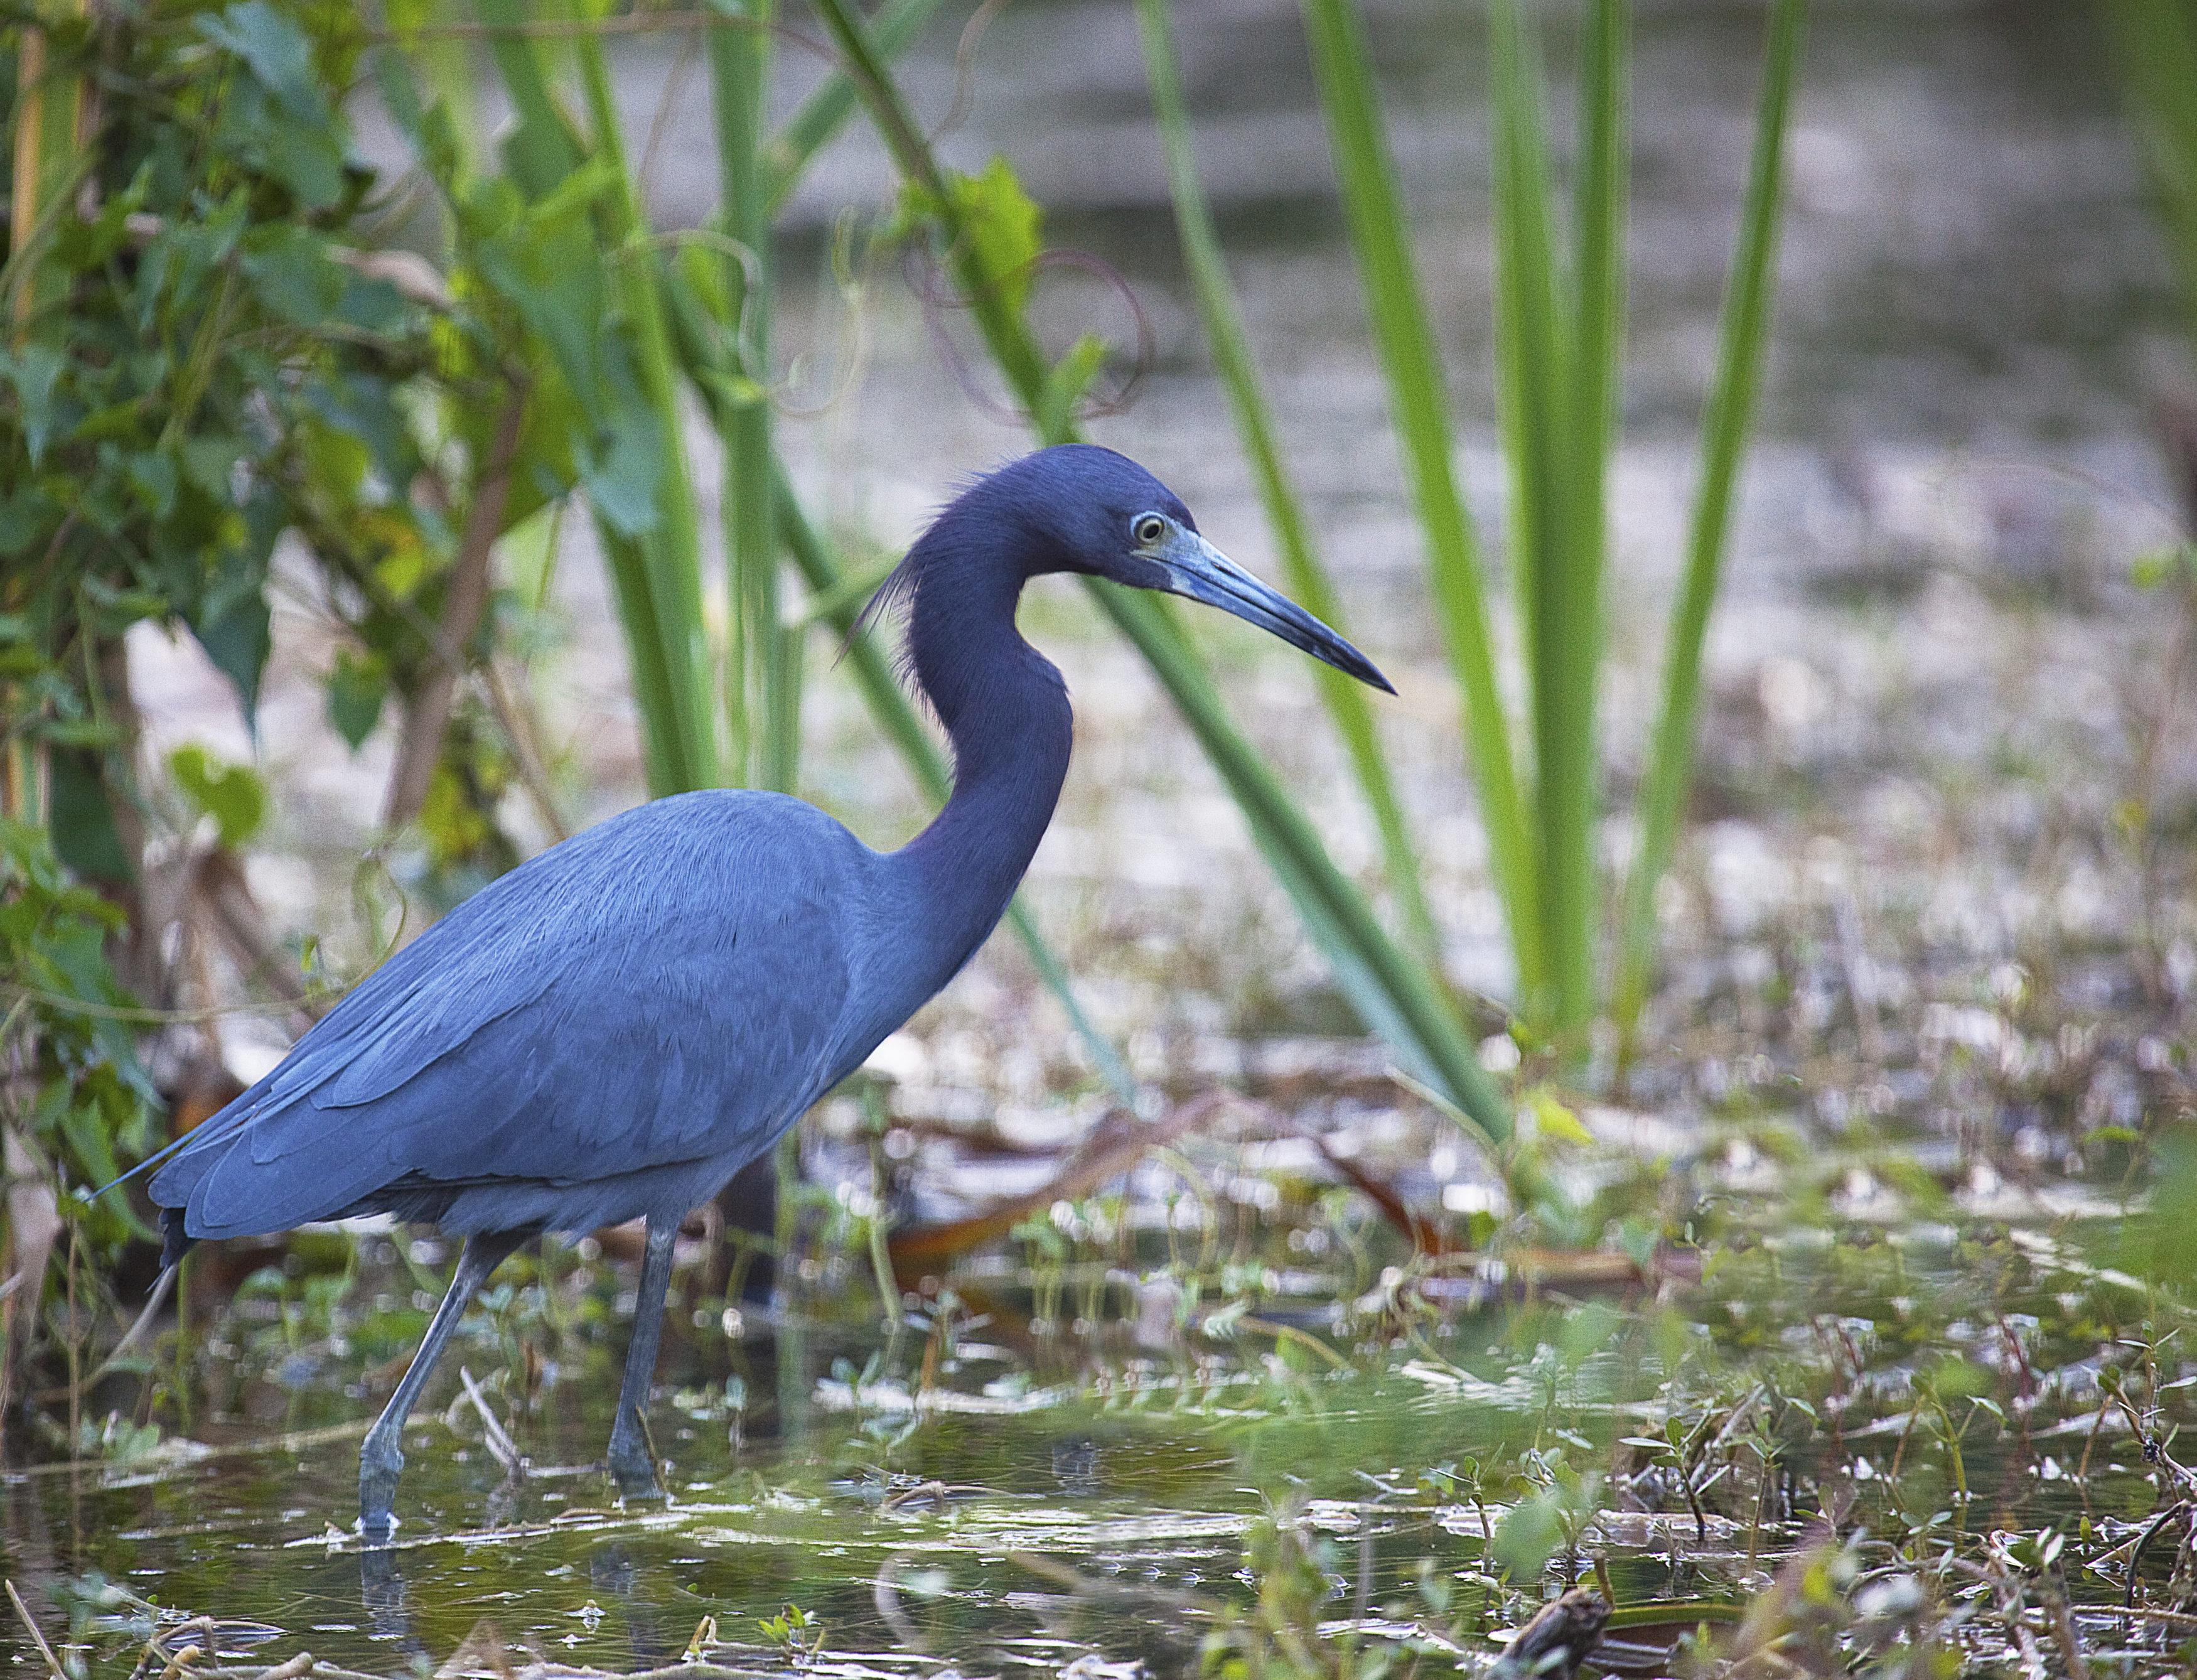 Everglades_Little_Blue_Heron-3500x2676.jpg